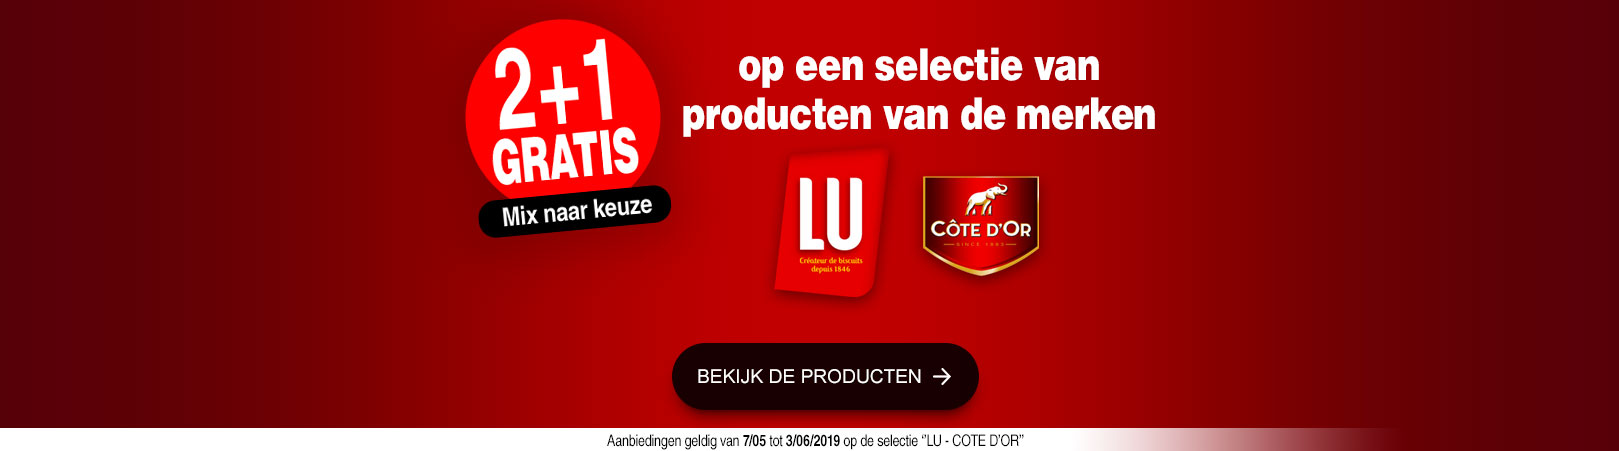 LU en COTE D'OR = 2+1 gratis